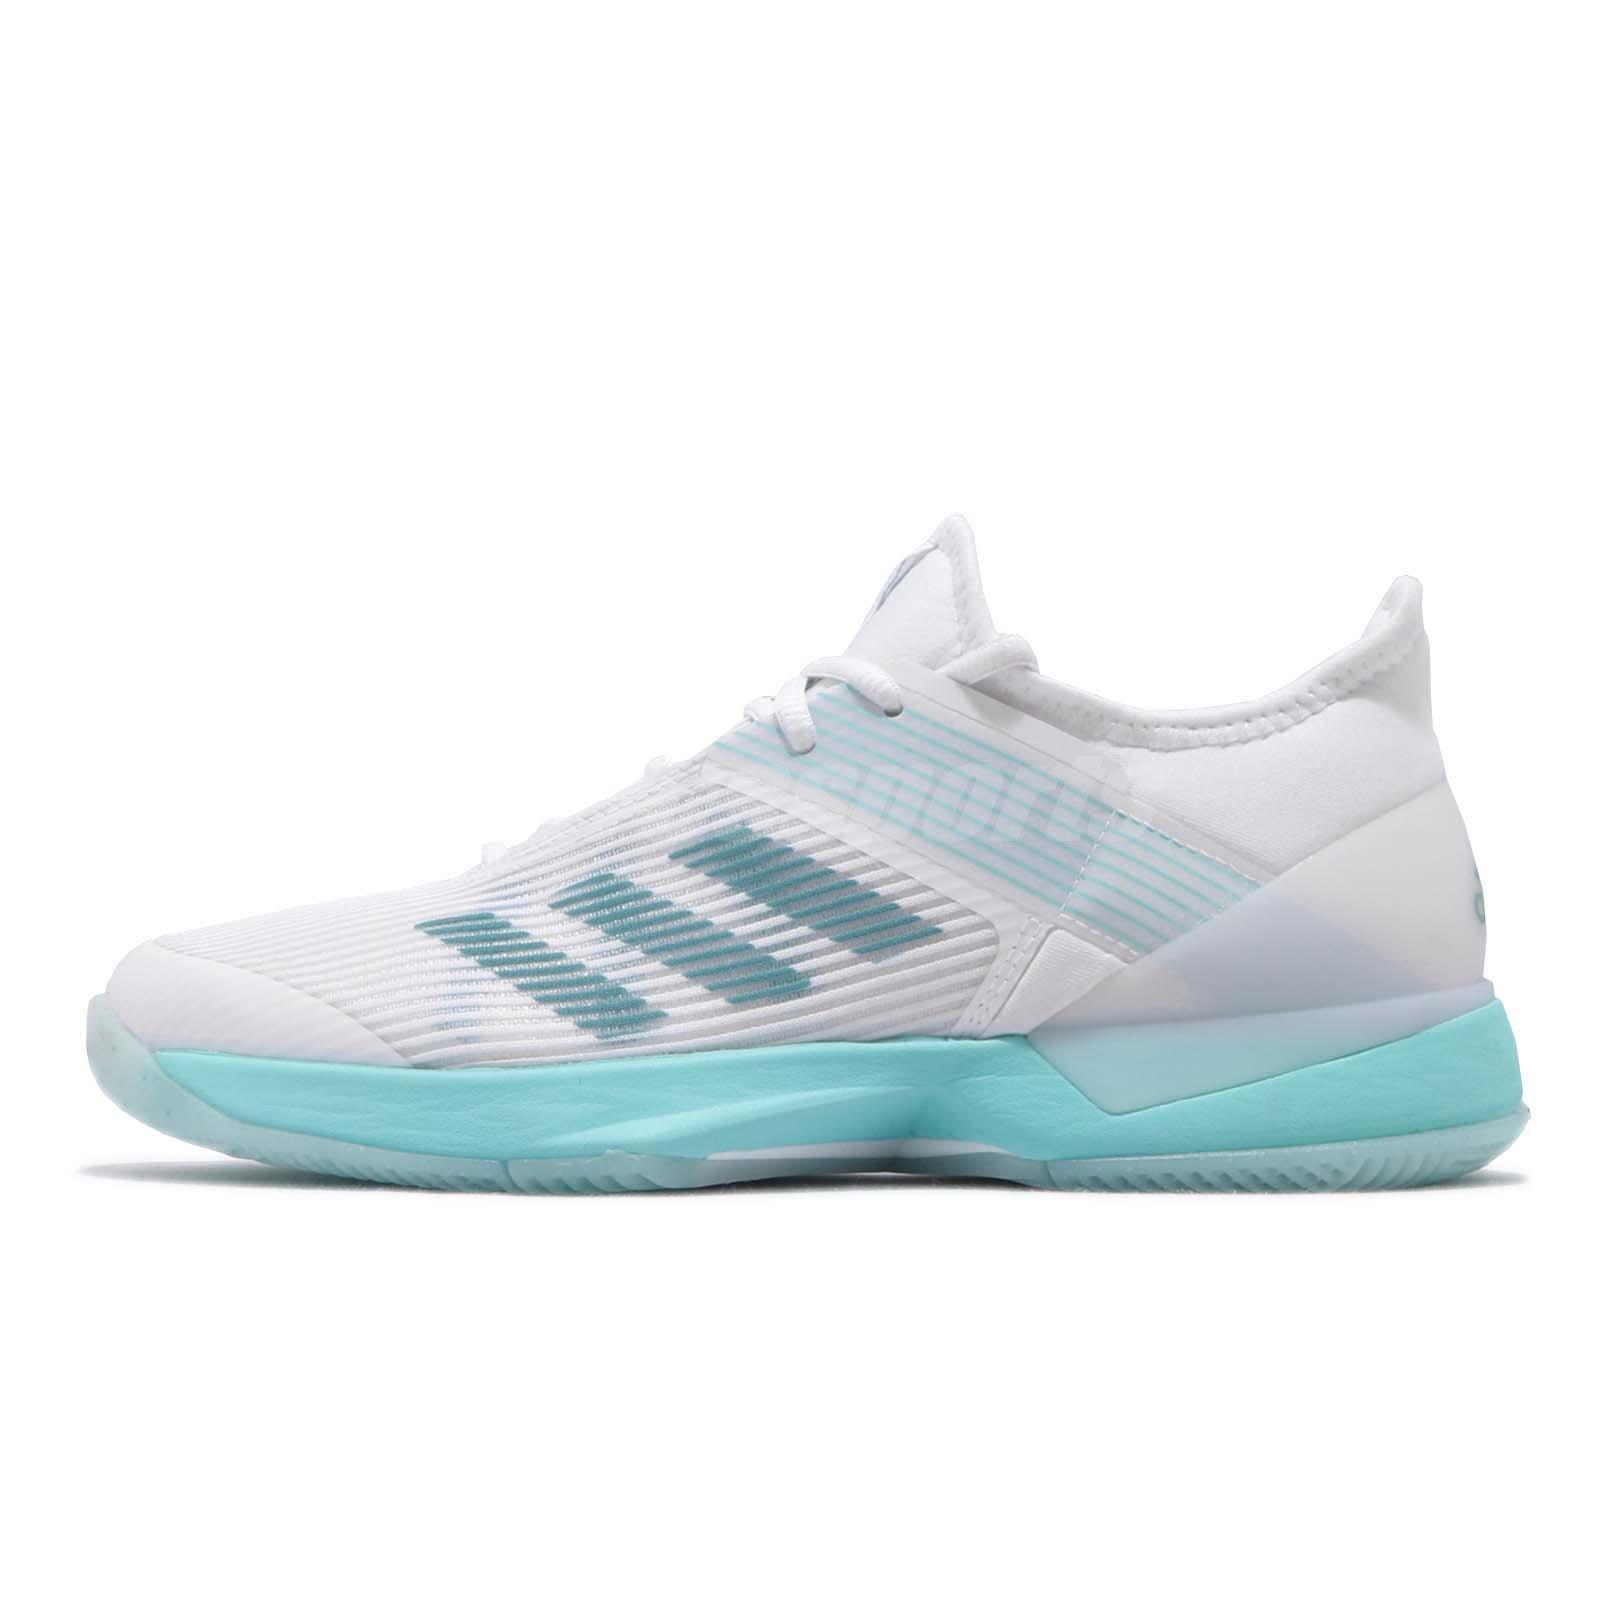 best sneakers ac498 11230 adidas Adizero Ubersonic 3 W X Parley Blue Spirit White Women Tennis Shoe  CG6443